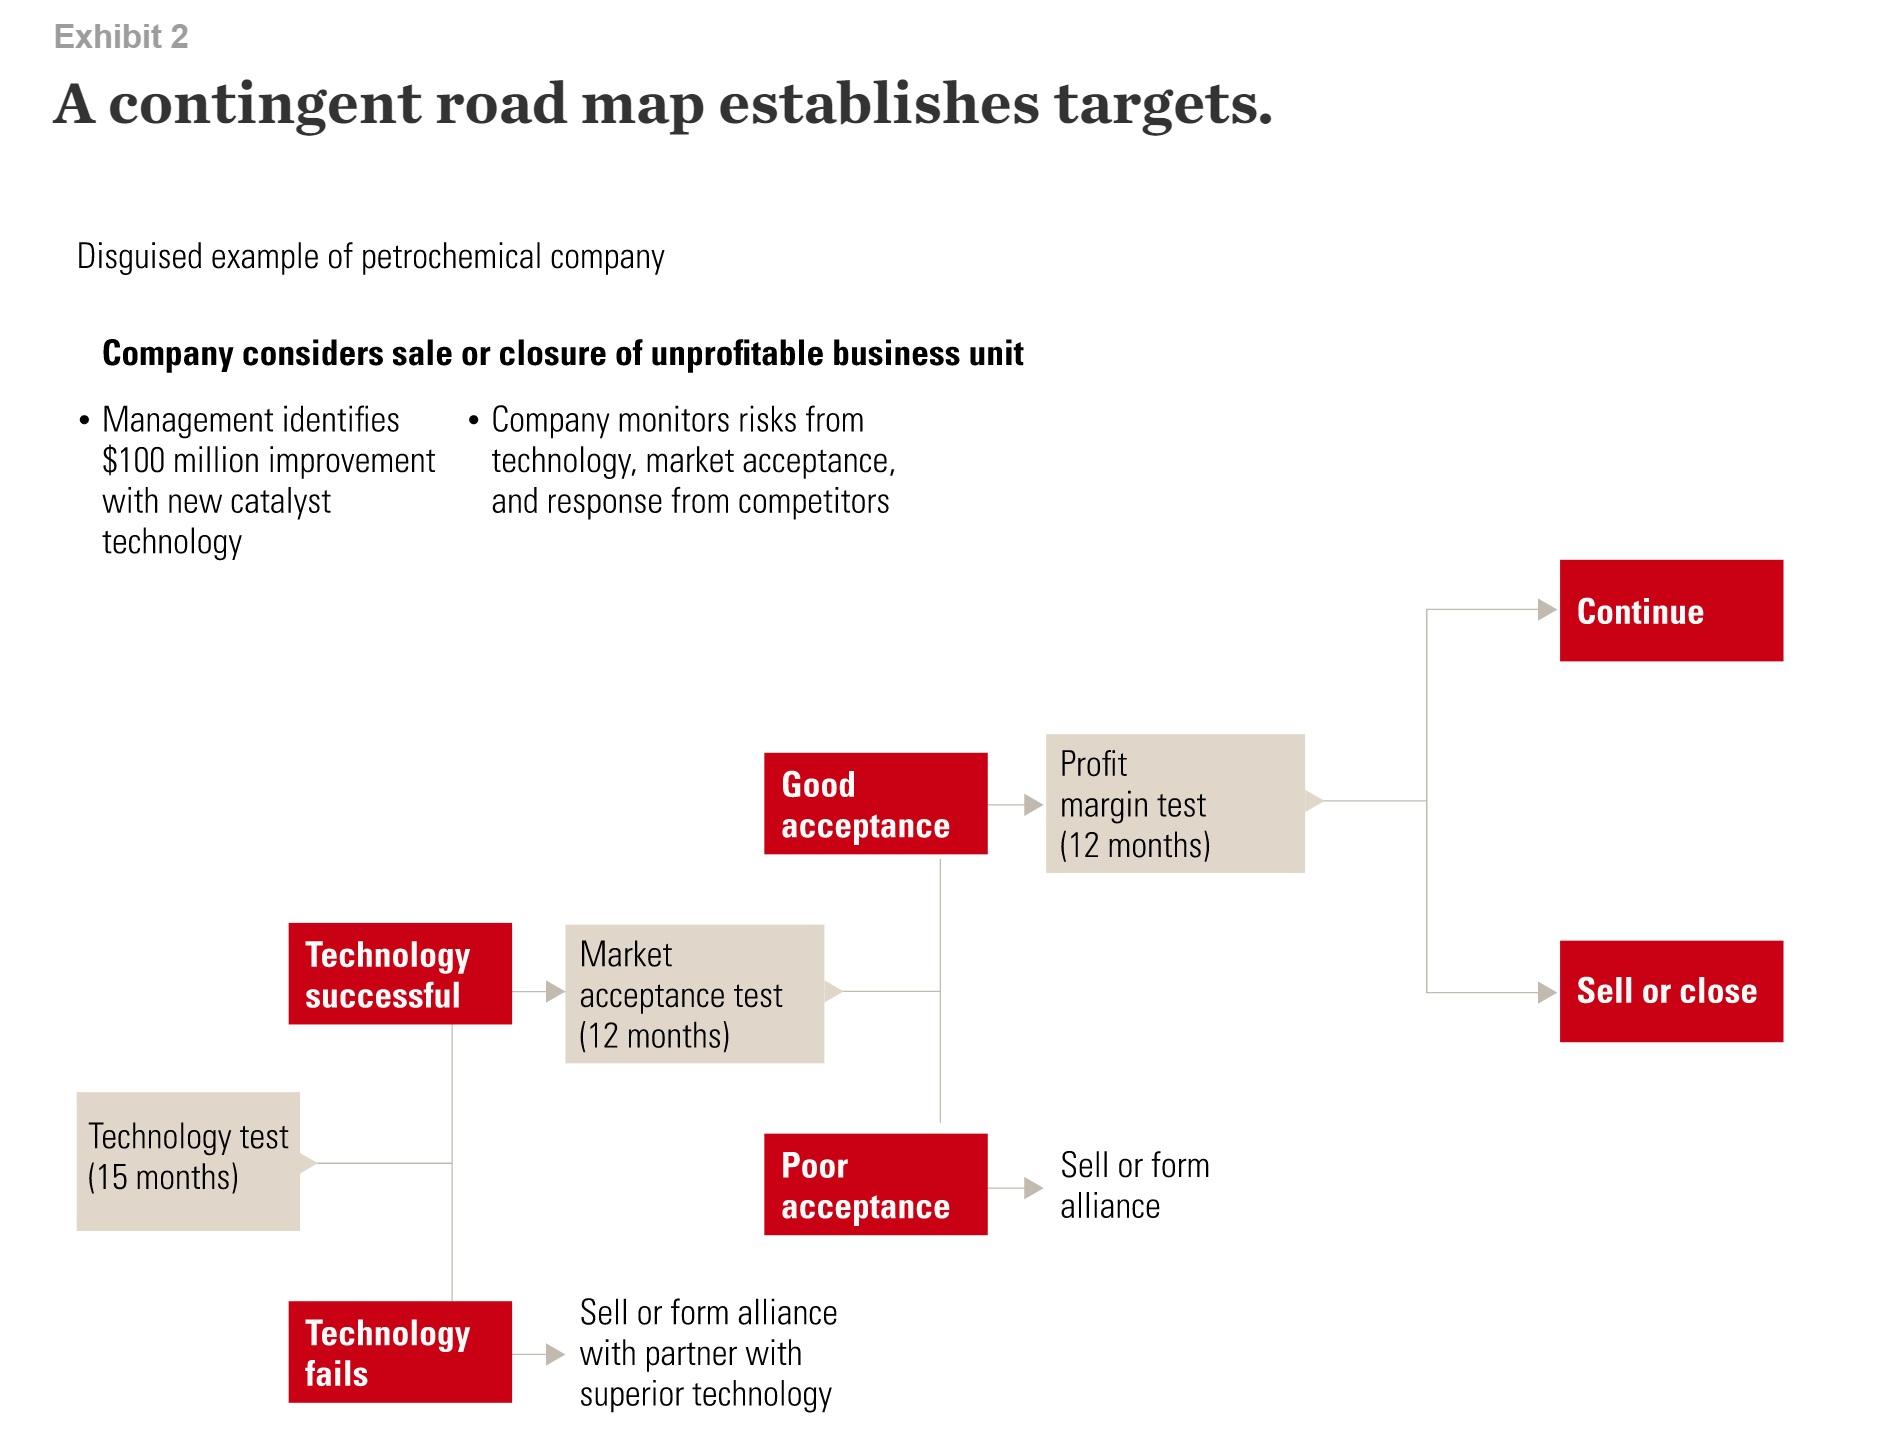 A contingent road map establishes targets.